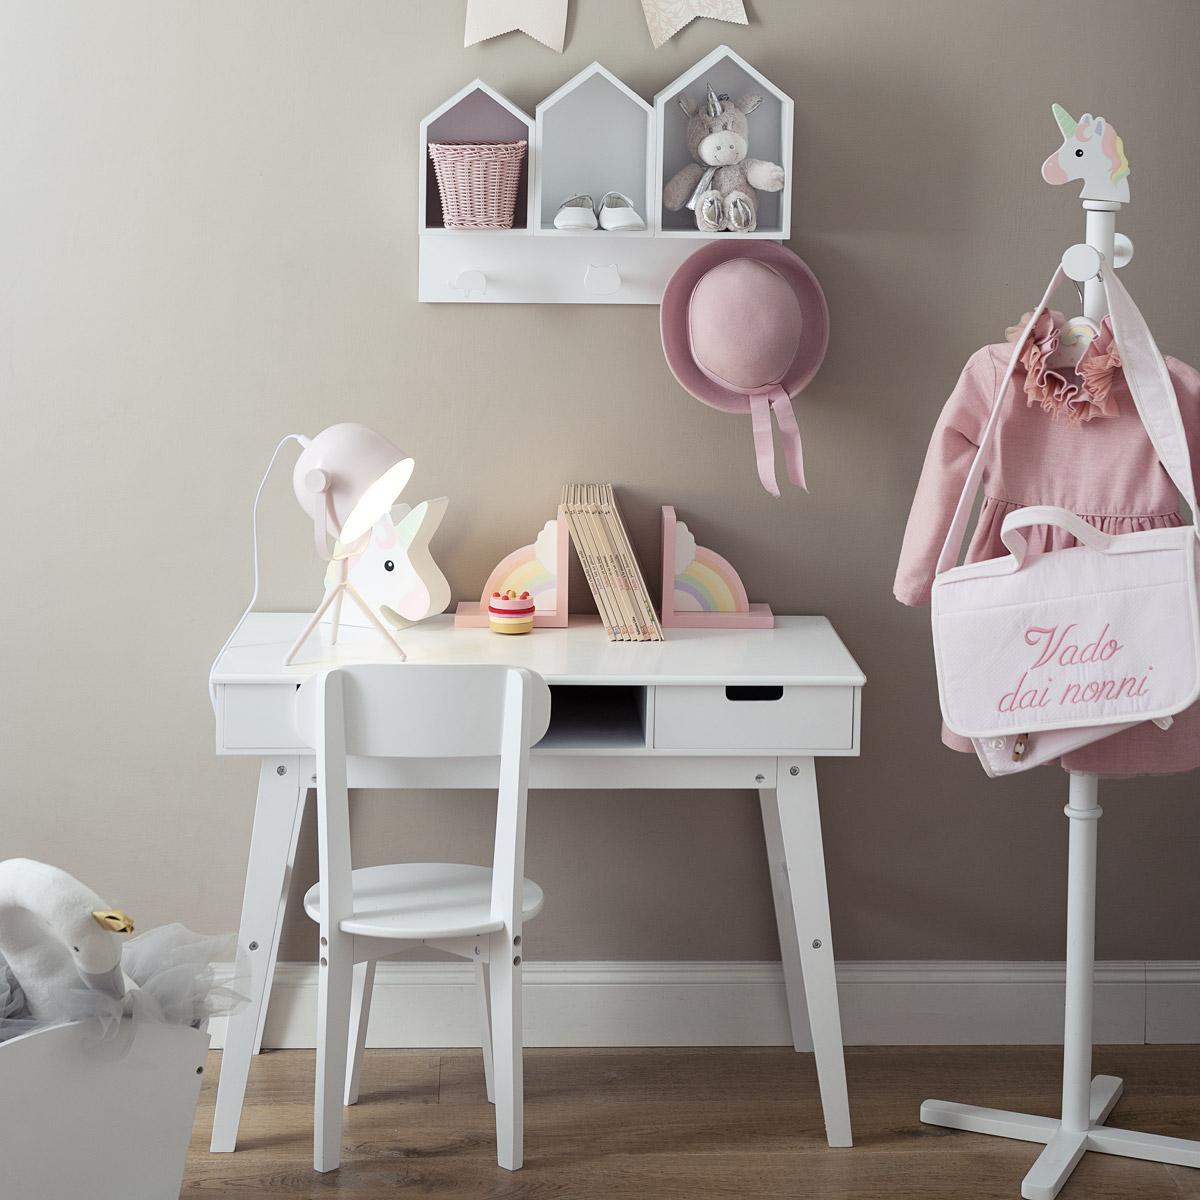 Blanc MariClo' Cameretta shabby chic per bambini mini-mobili - Blog